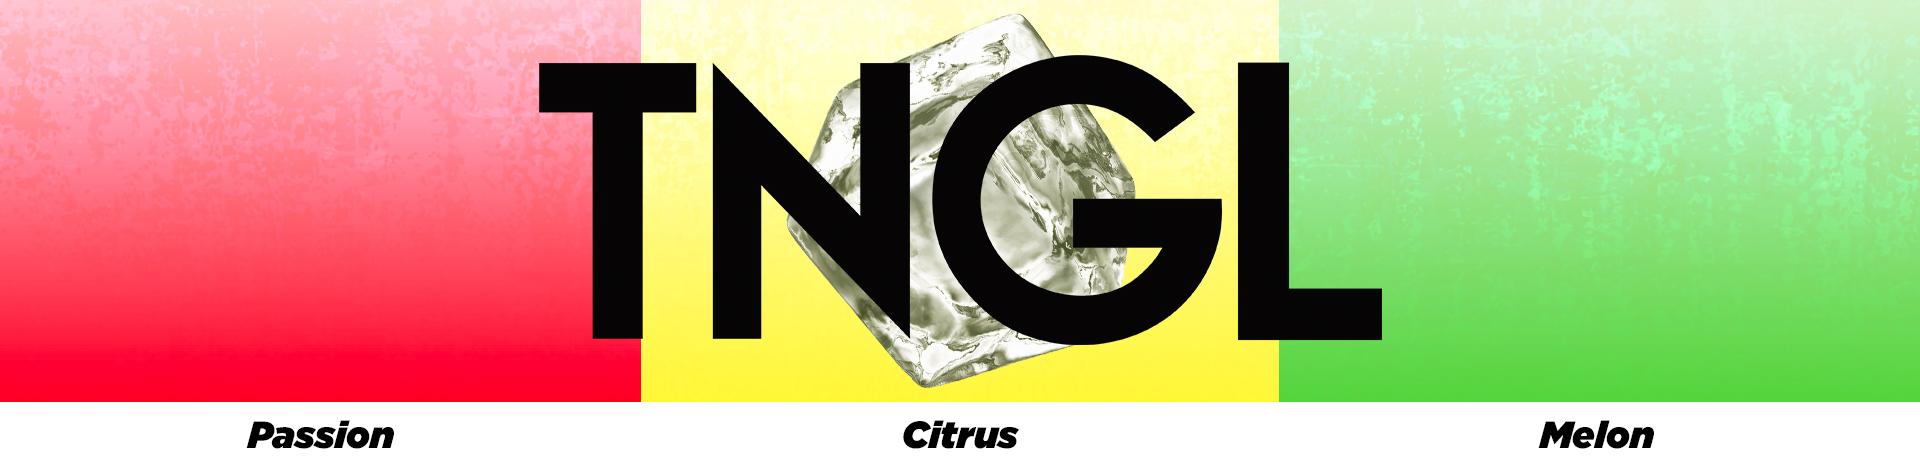 TNGL-banner